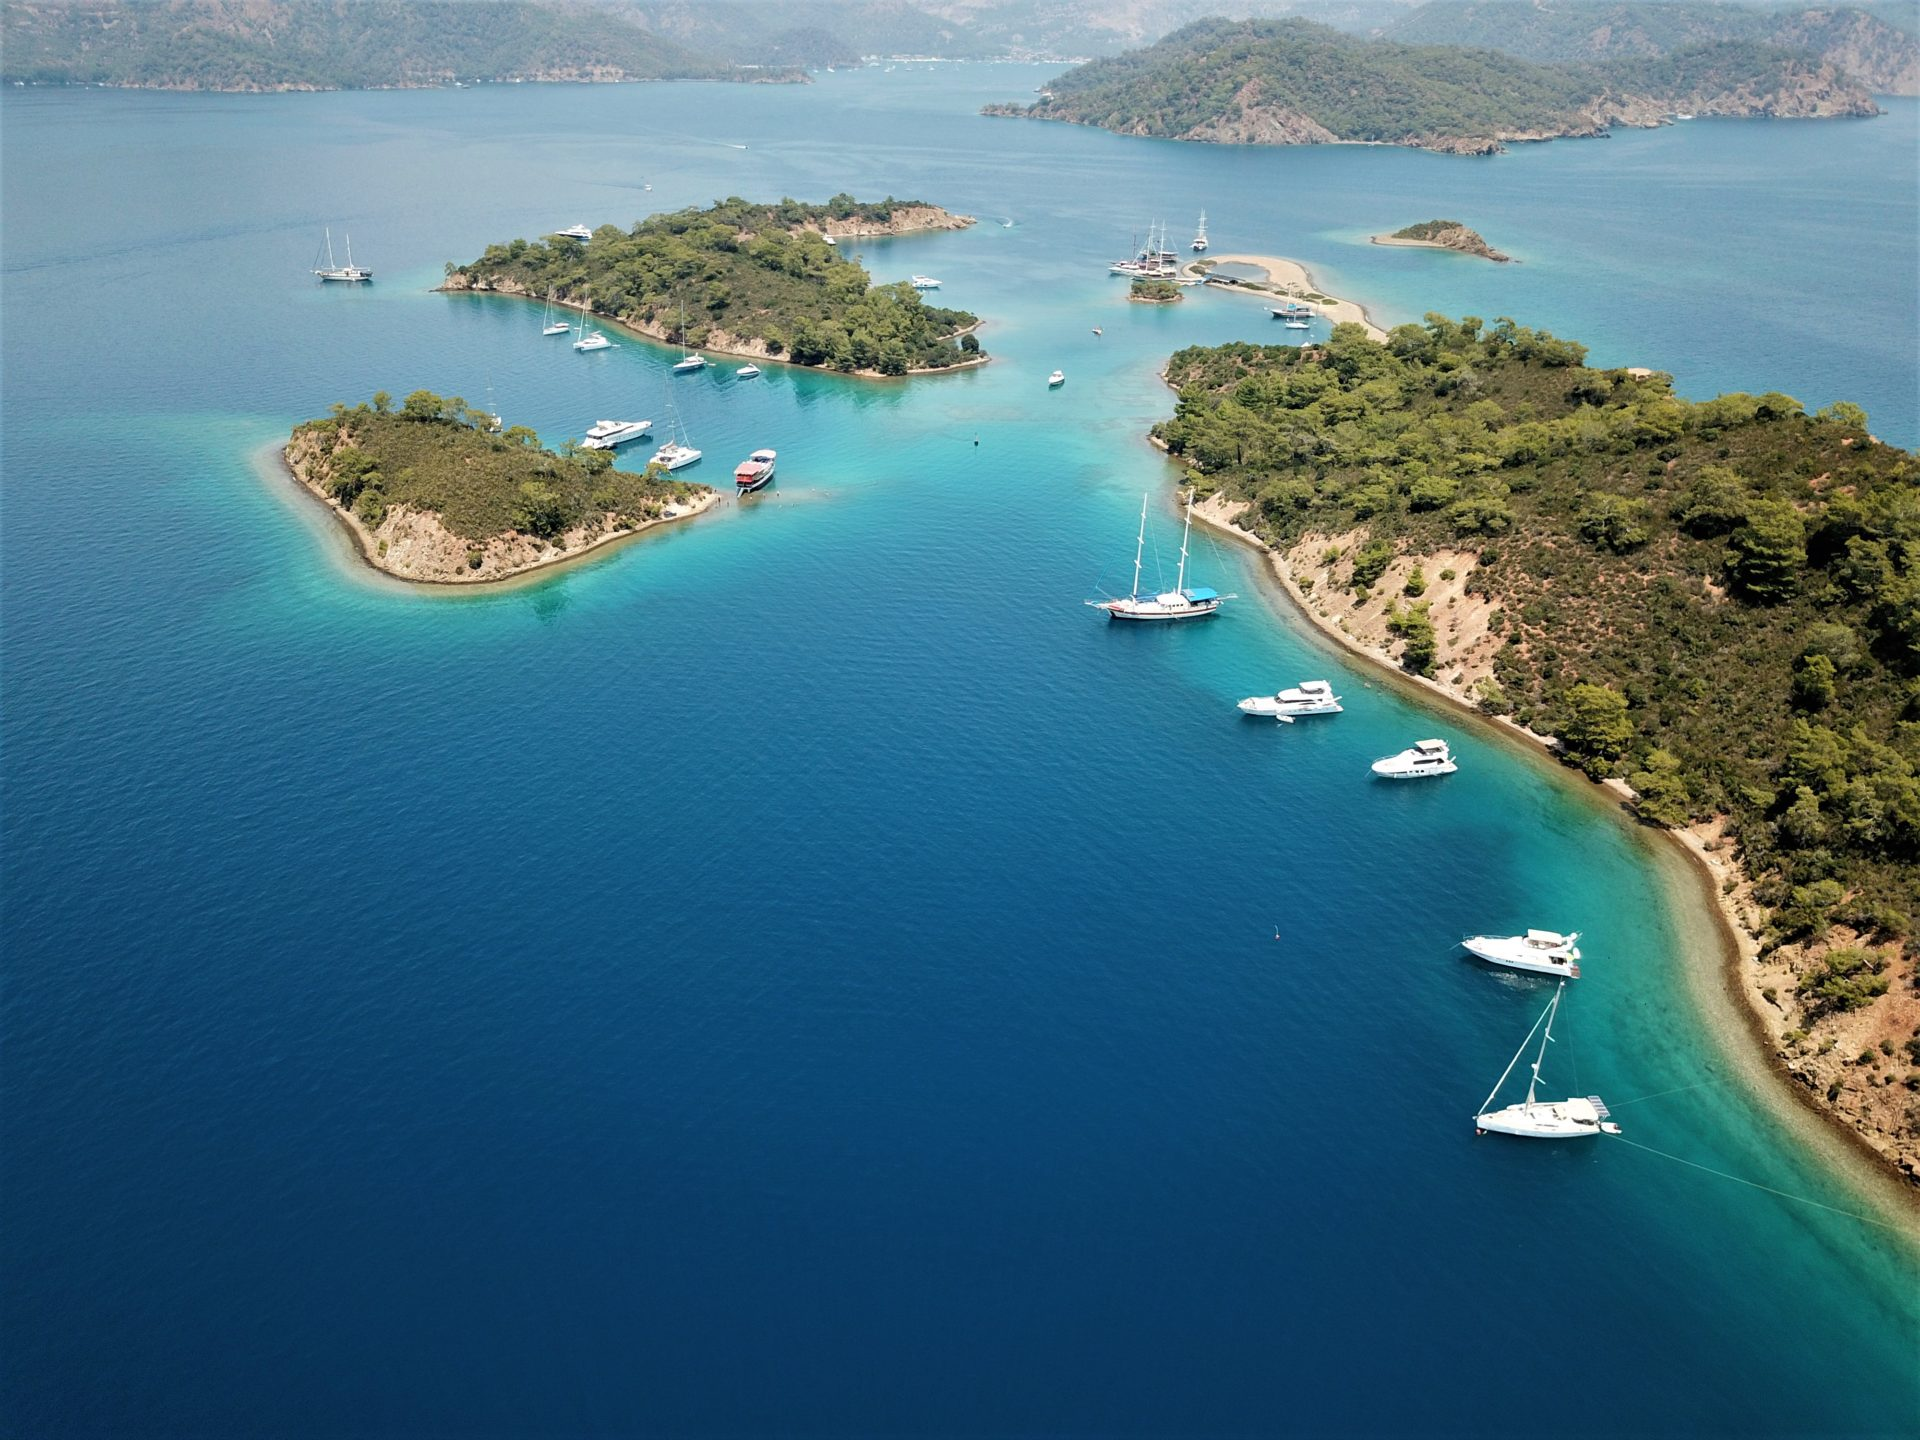 Bozburun Ocean Mountain Ocean Island Boat TJB Superyachts